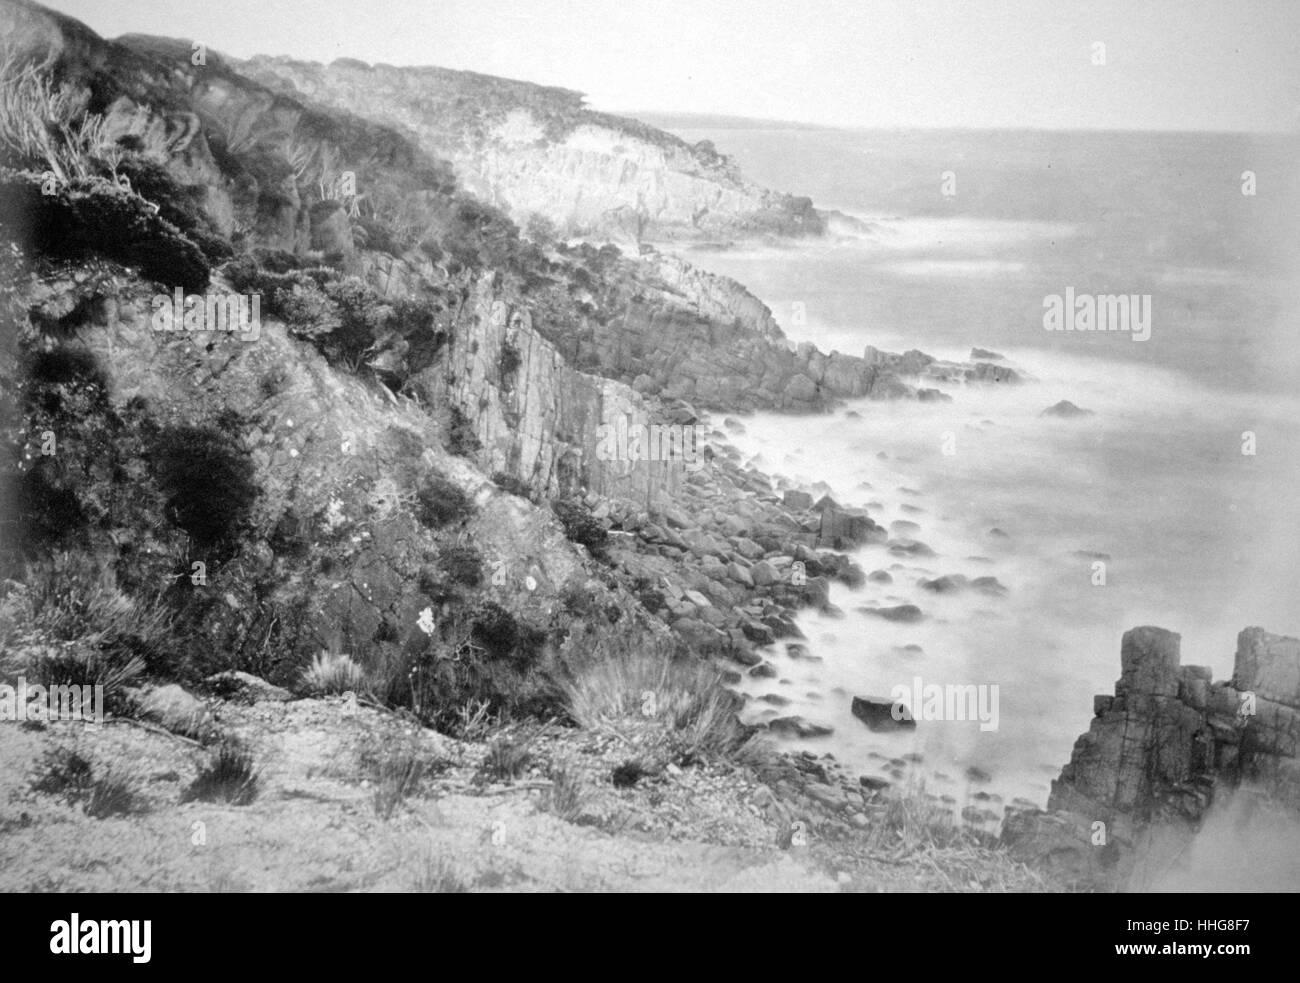 Coast at Port Jackson, Australia 1885 - Stock Image